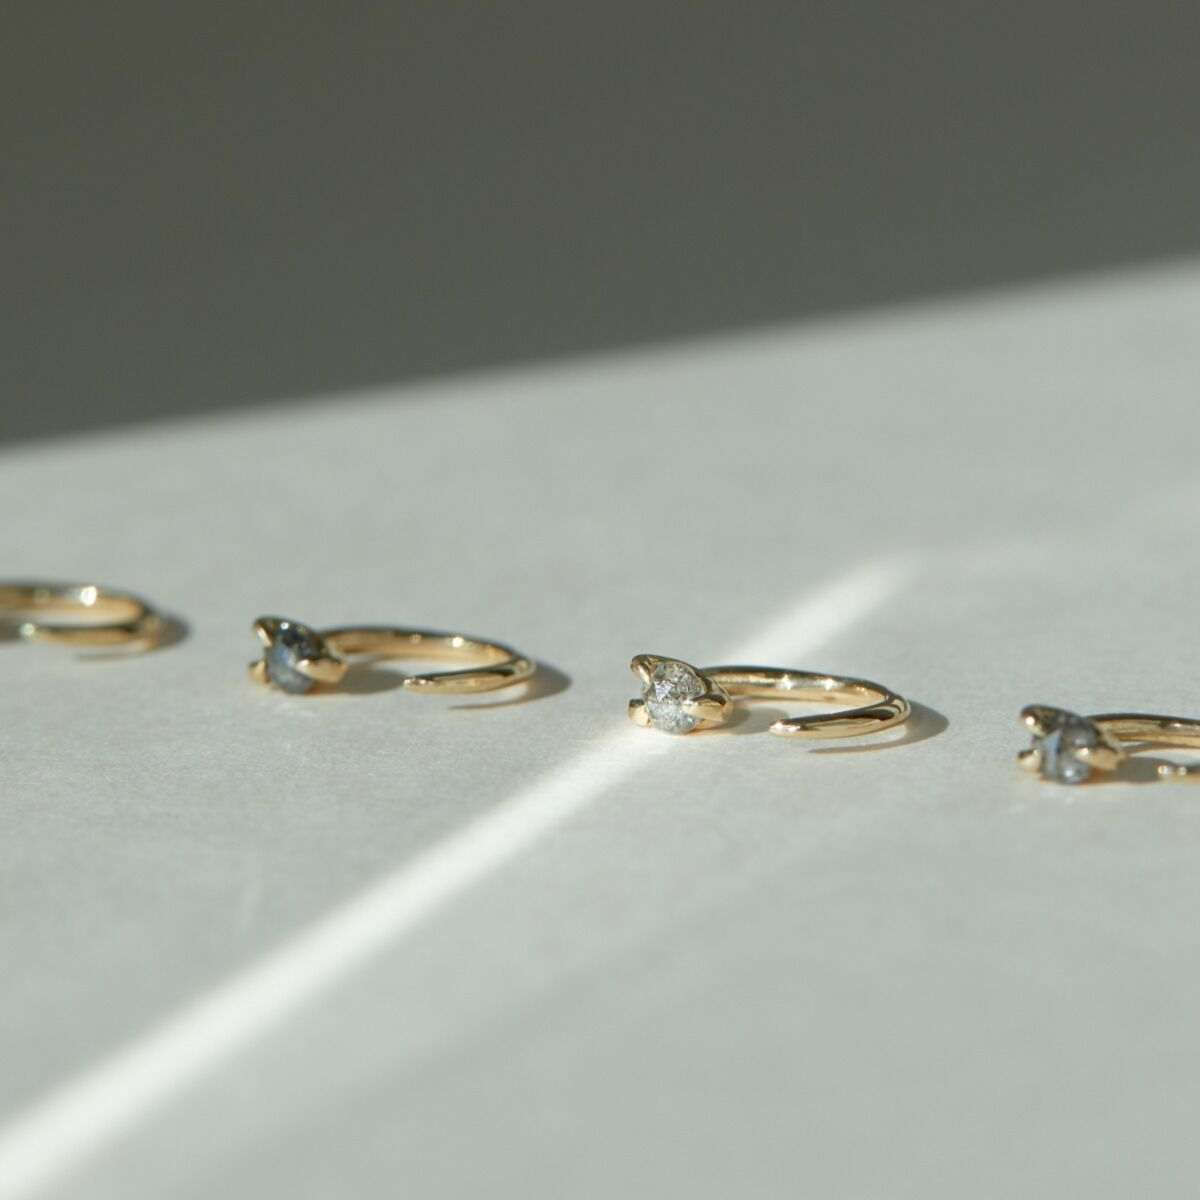 Nectar Earring (single) image